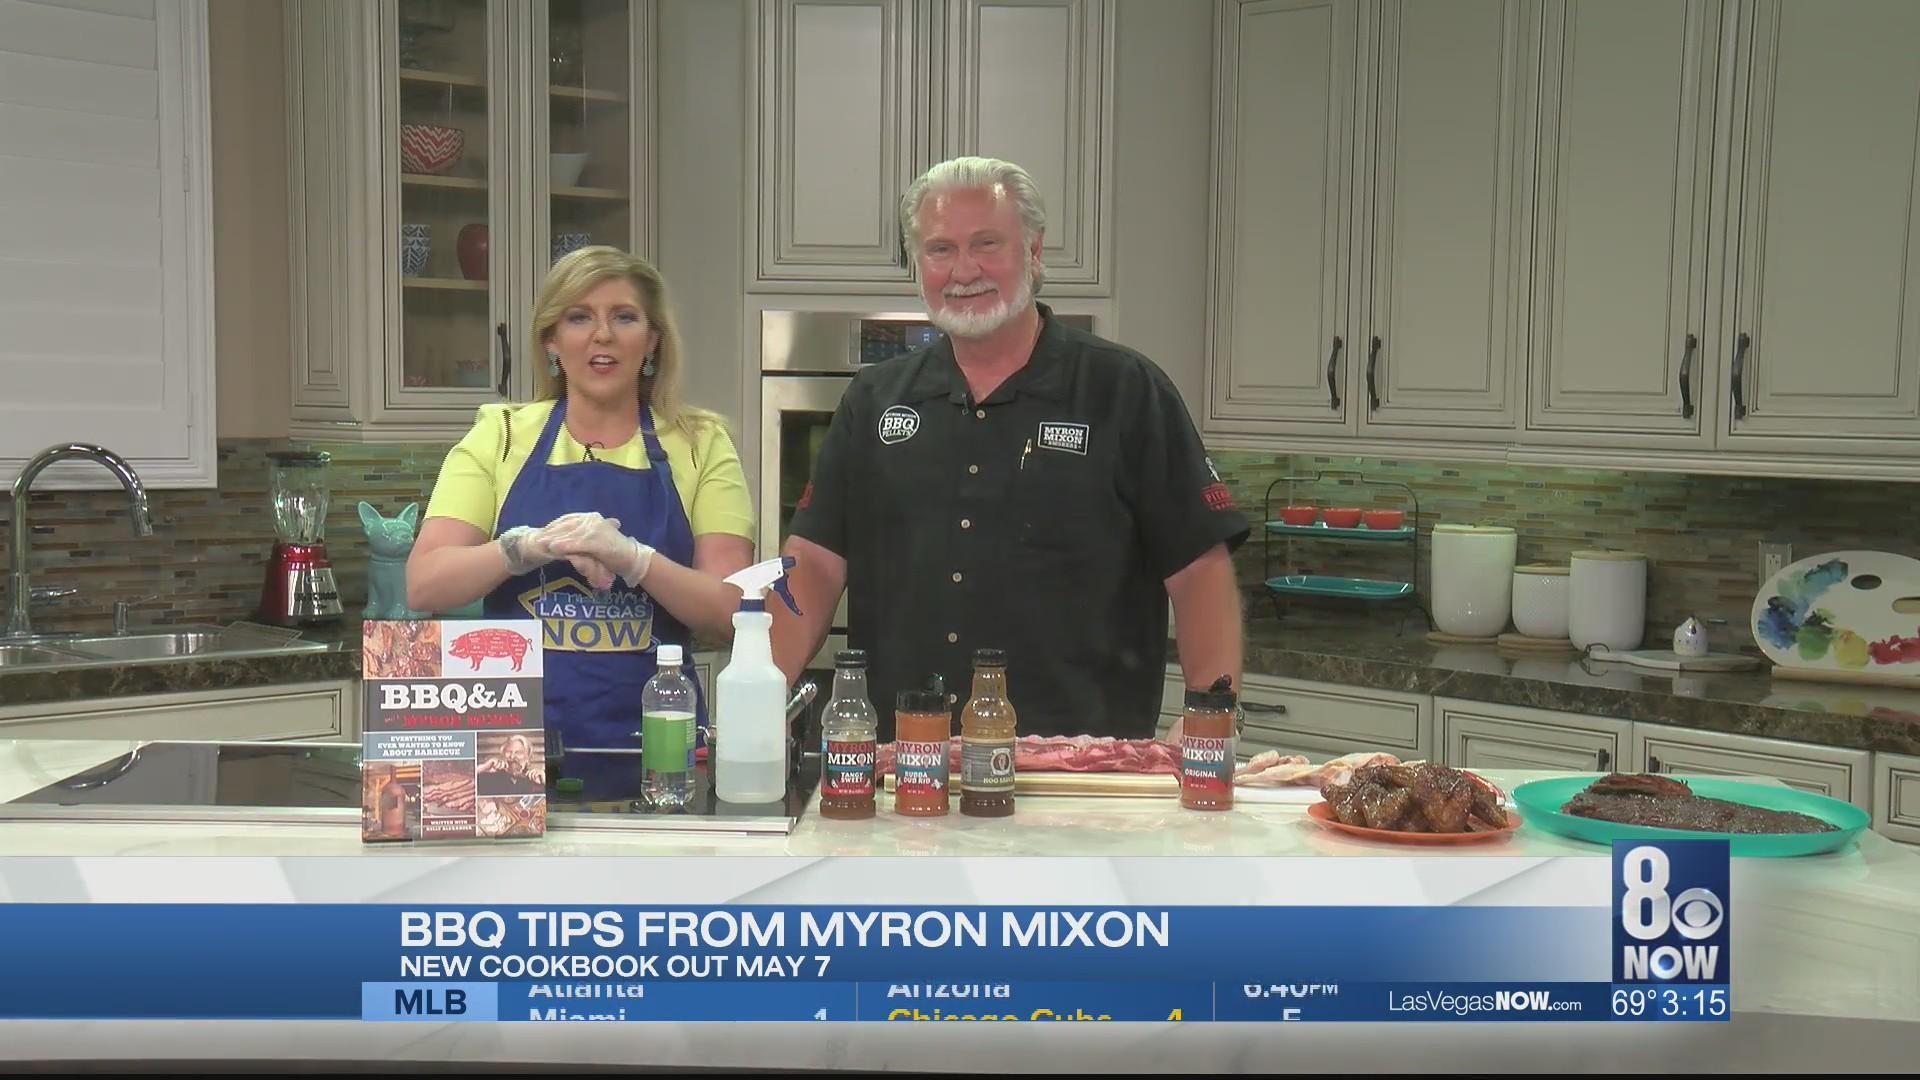 BBQ tips from Myron Mixon